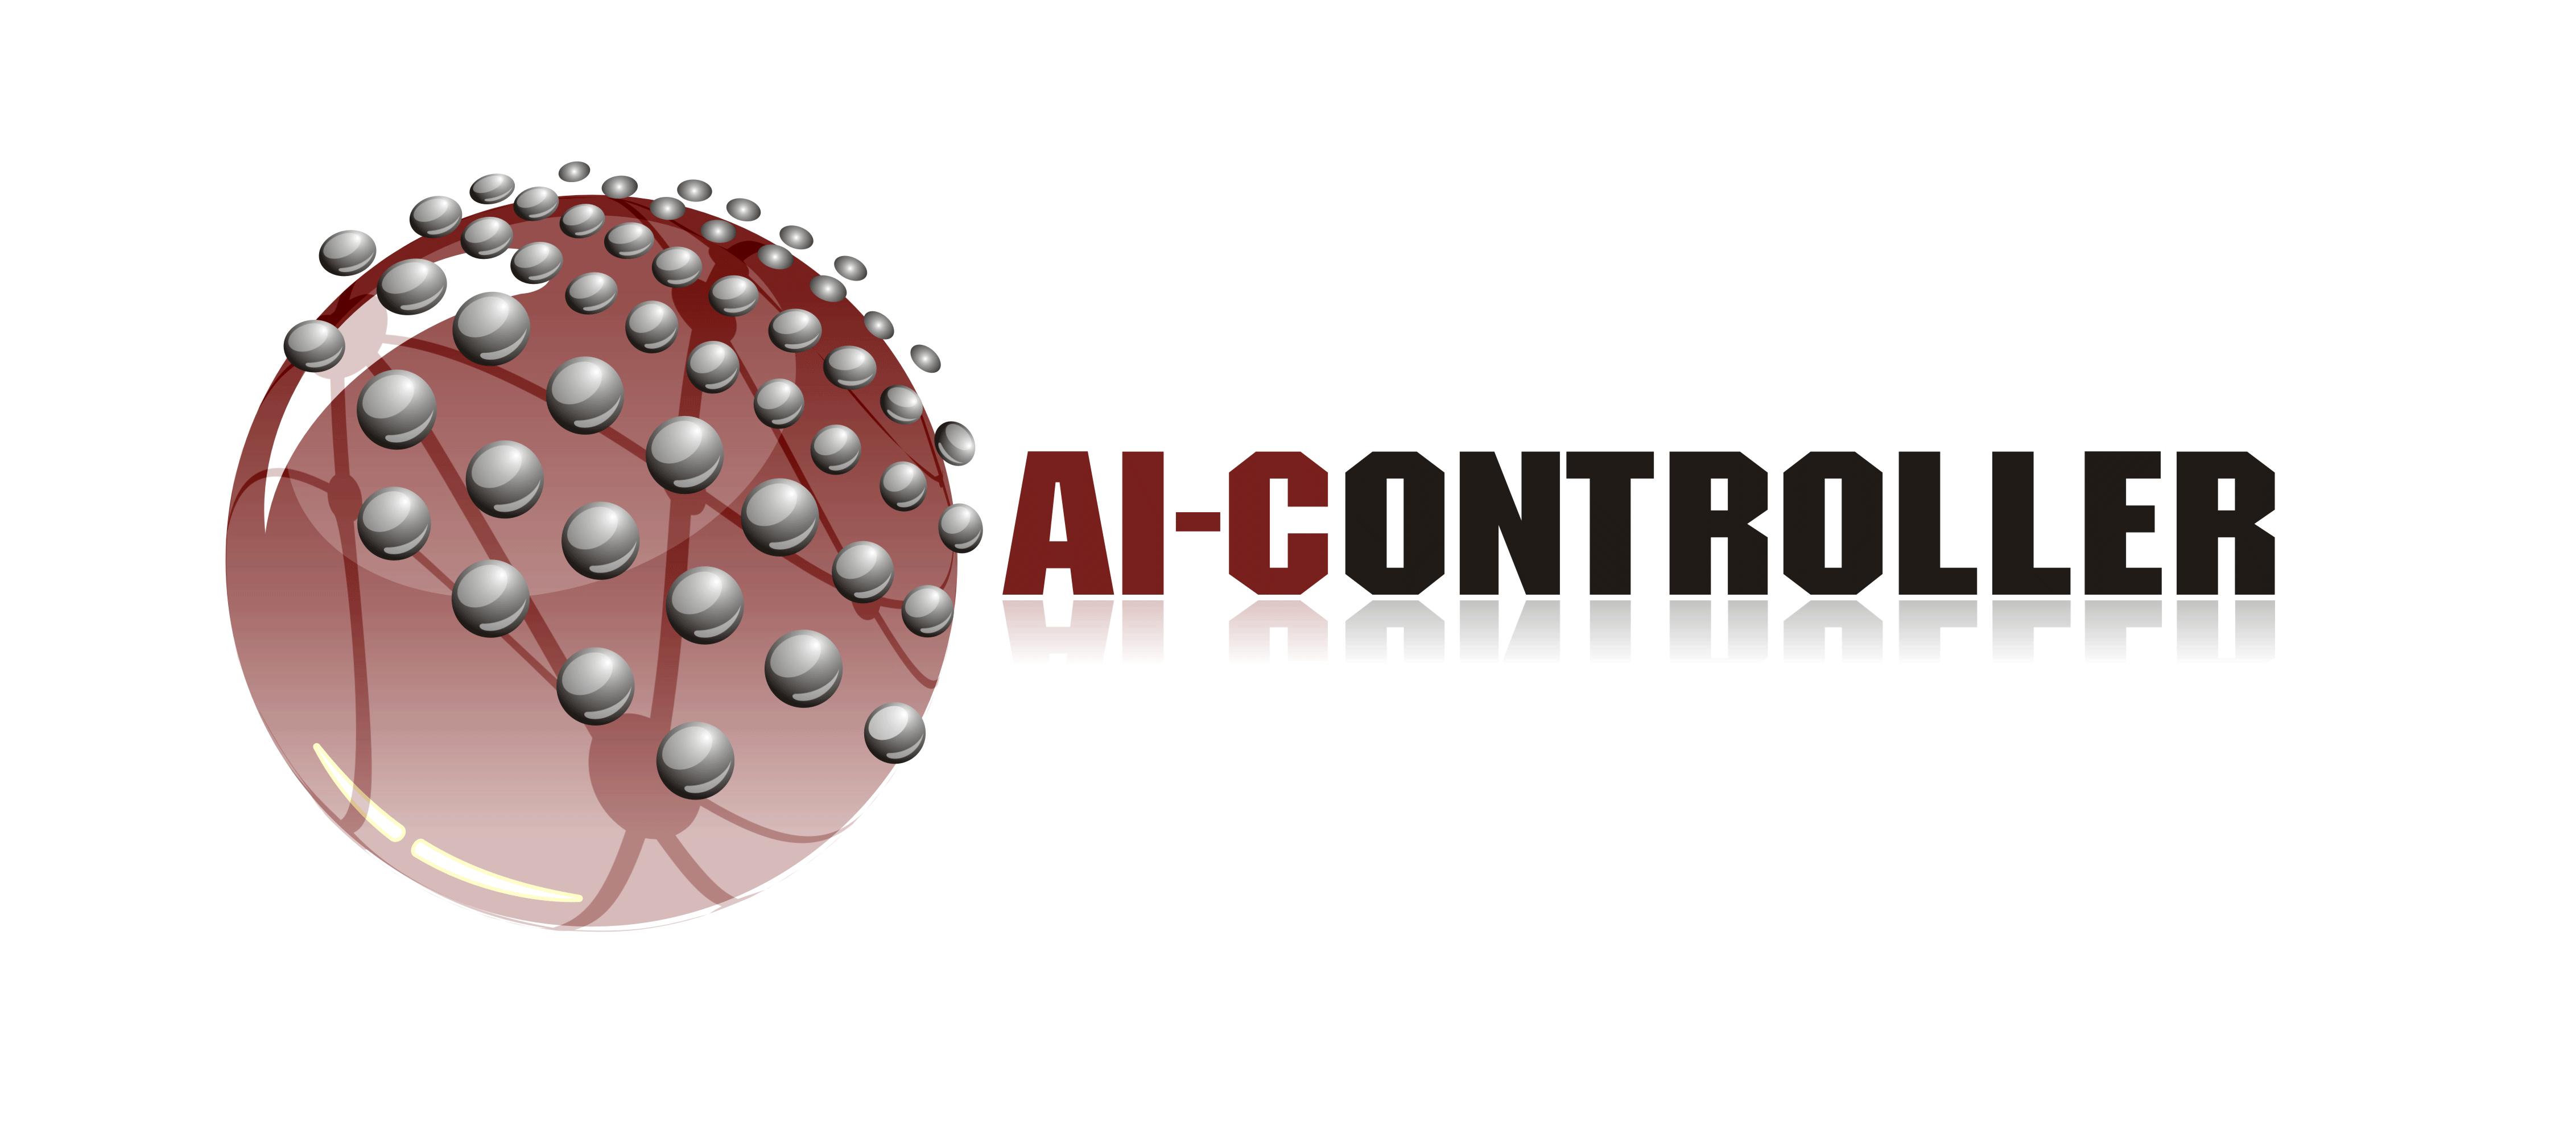 Ingenieros Ai-controller